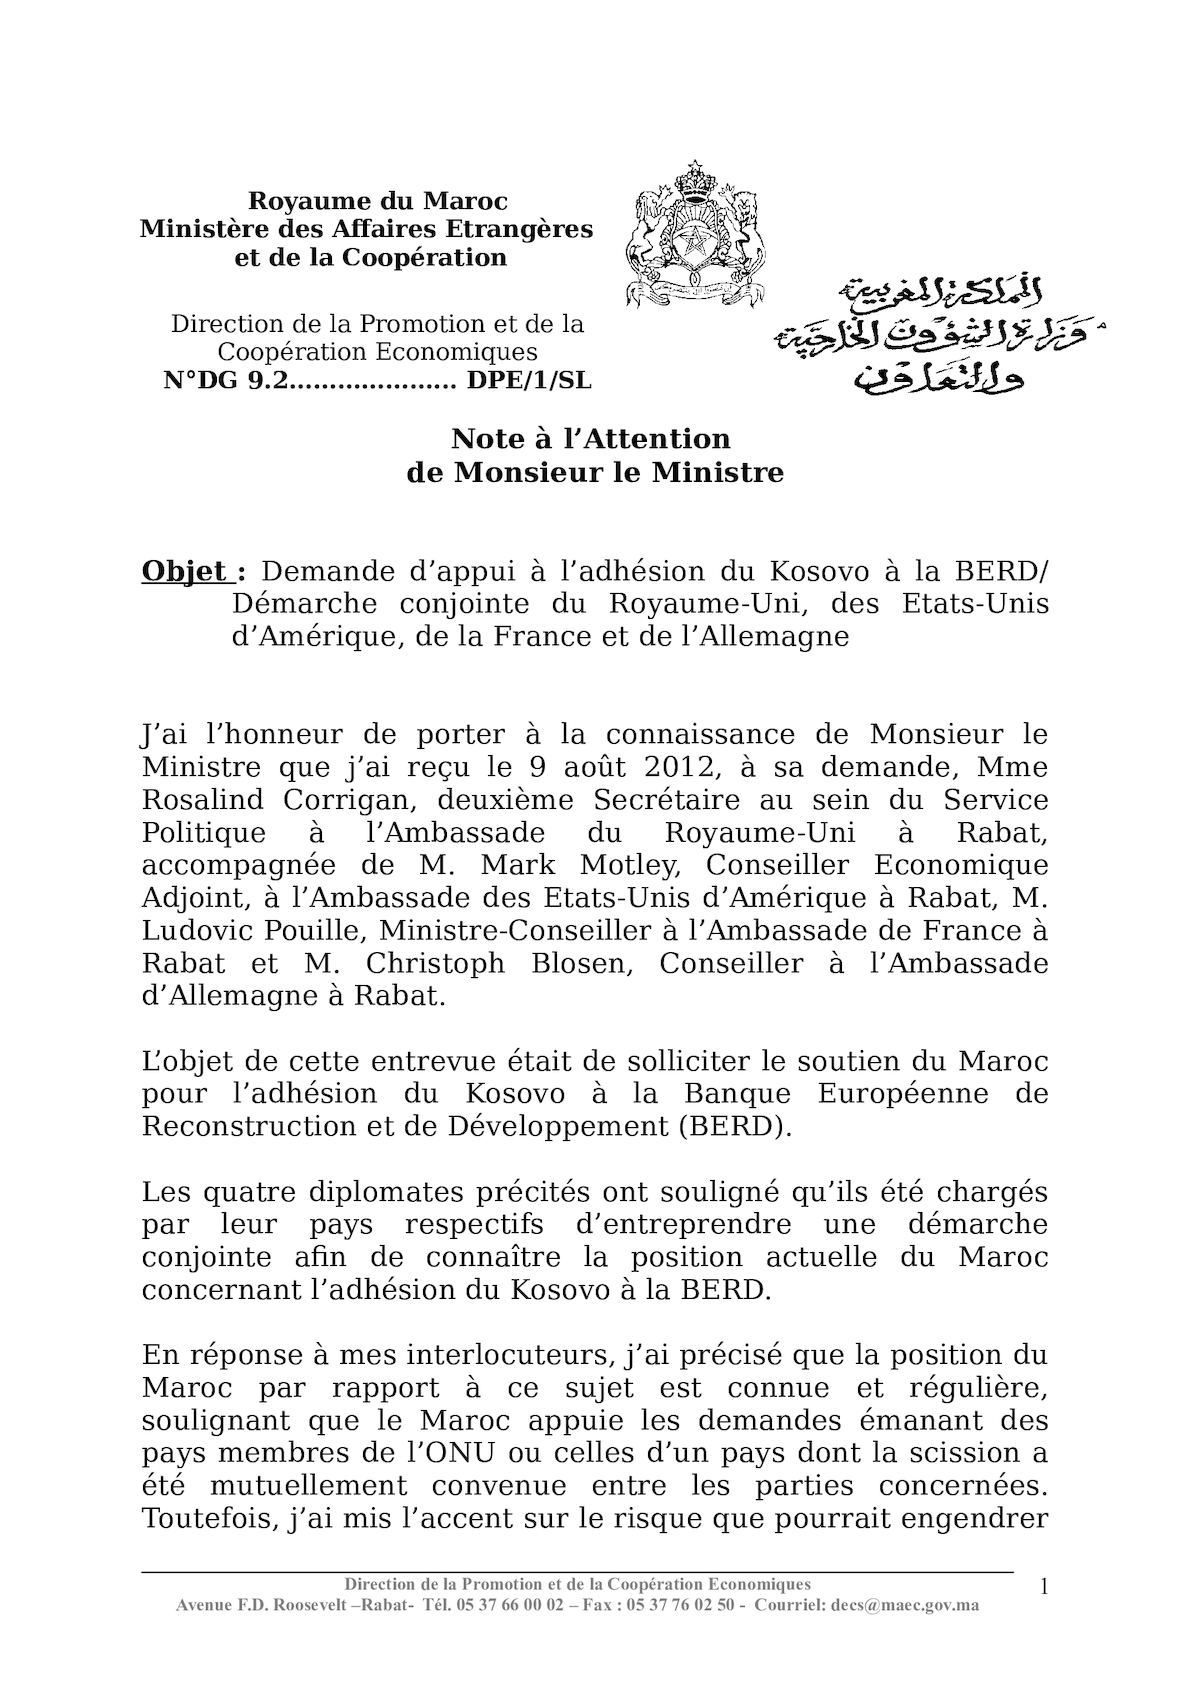 CR Entretien UK France USA GR Kosovo Berd